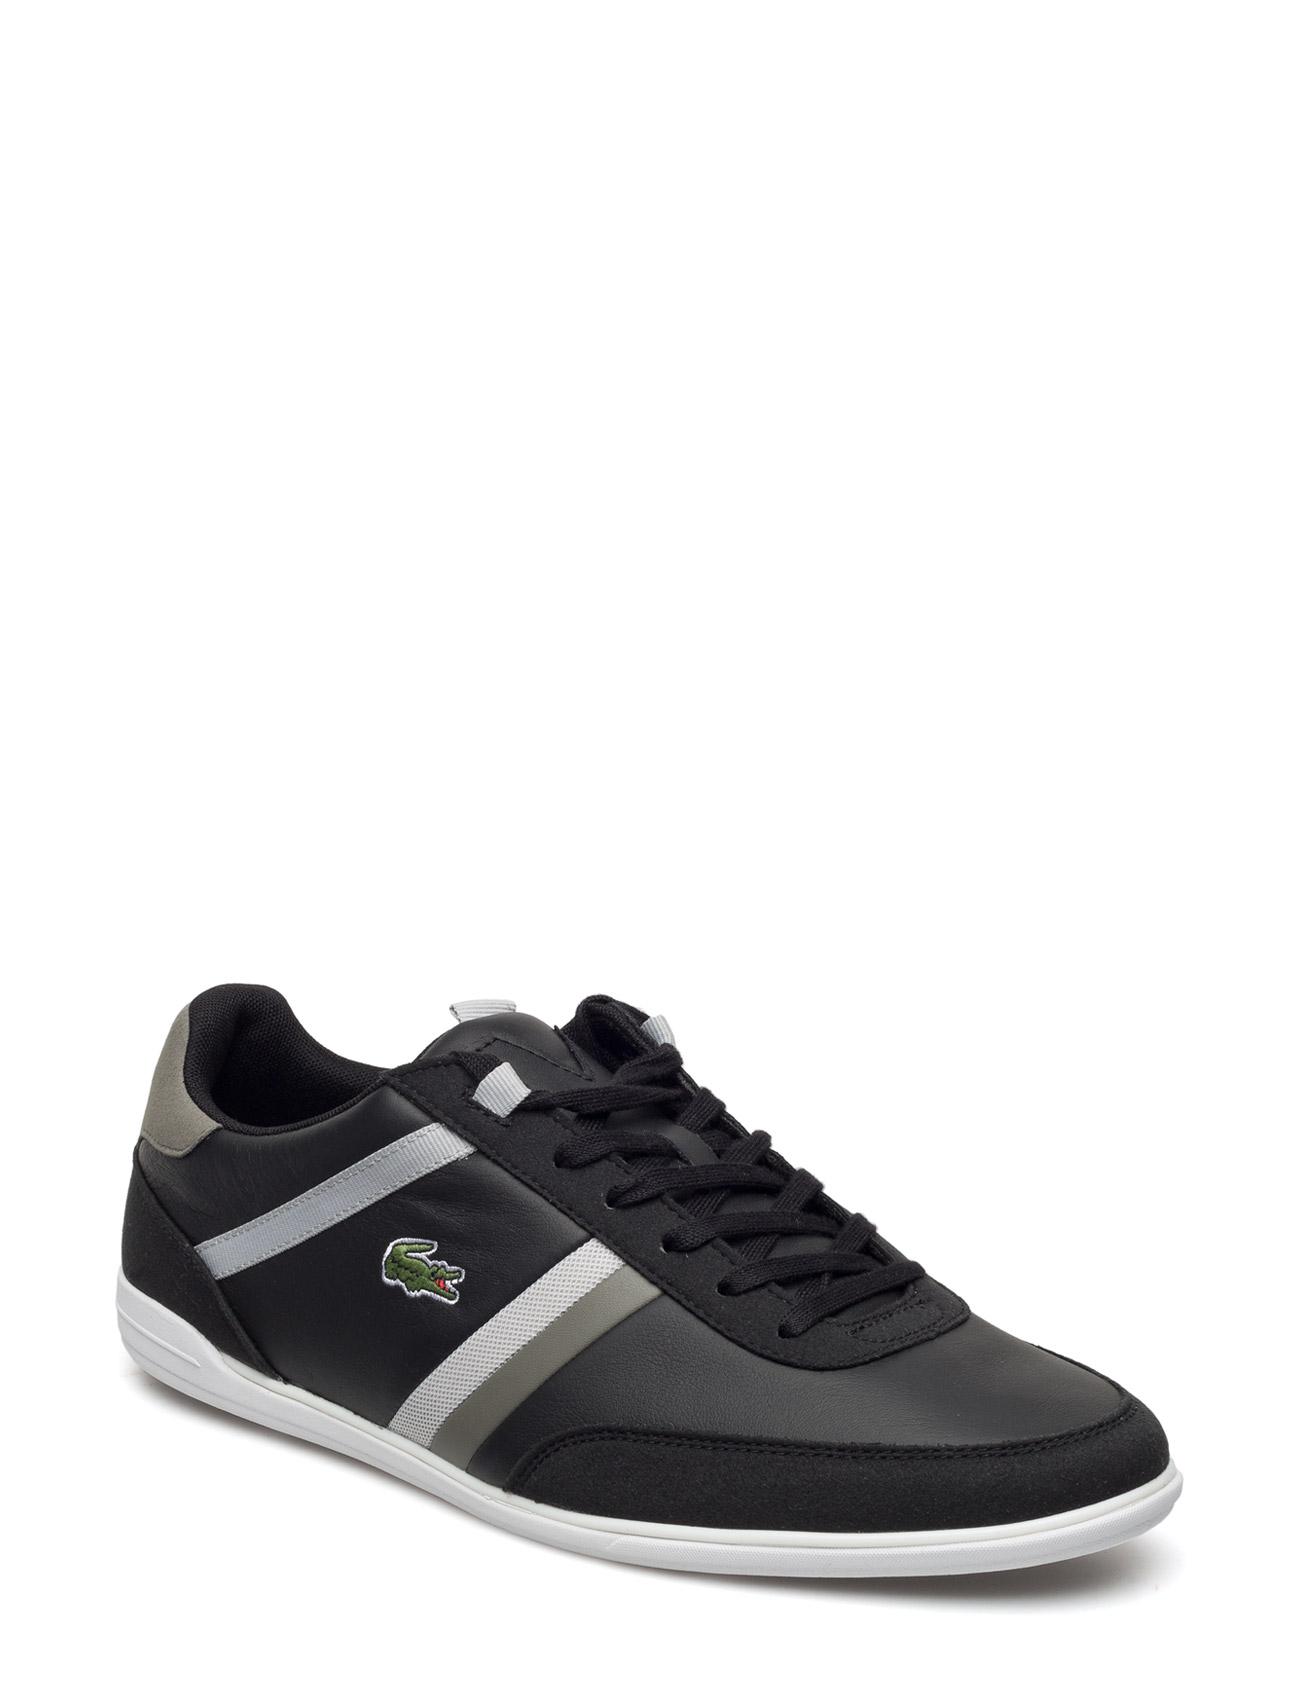 Giron 117 1 Lacoste Shoes Sneakers til Herrer i Sort